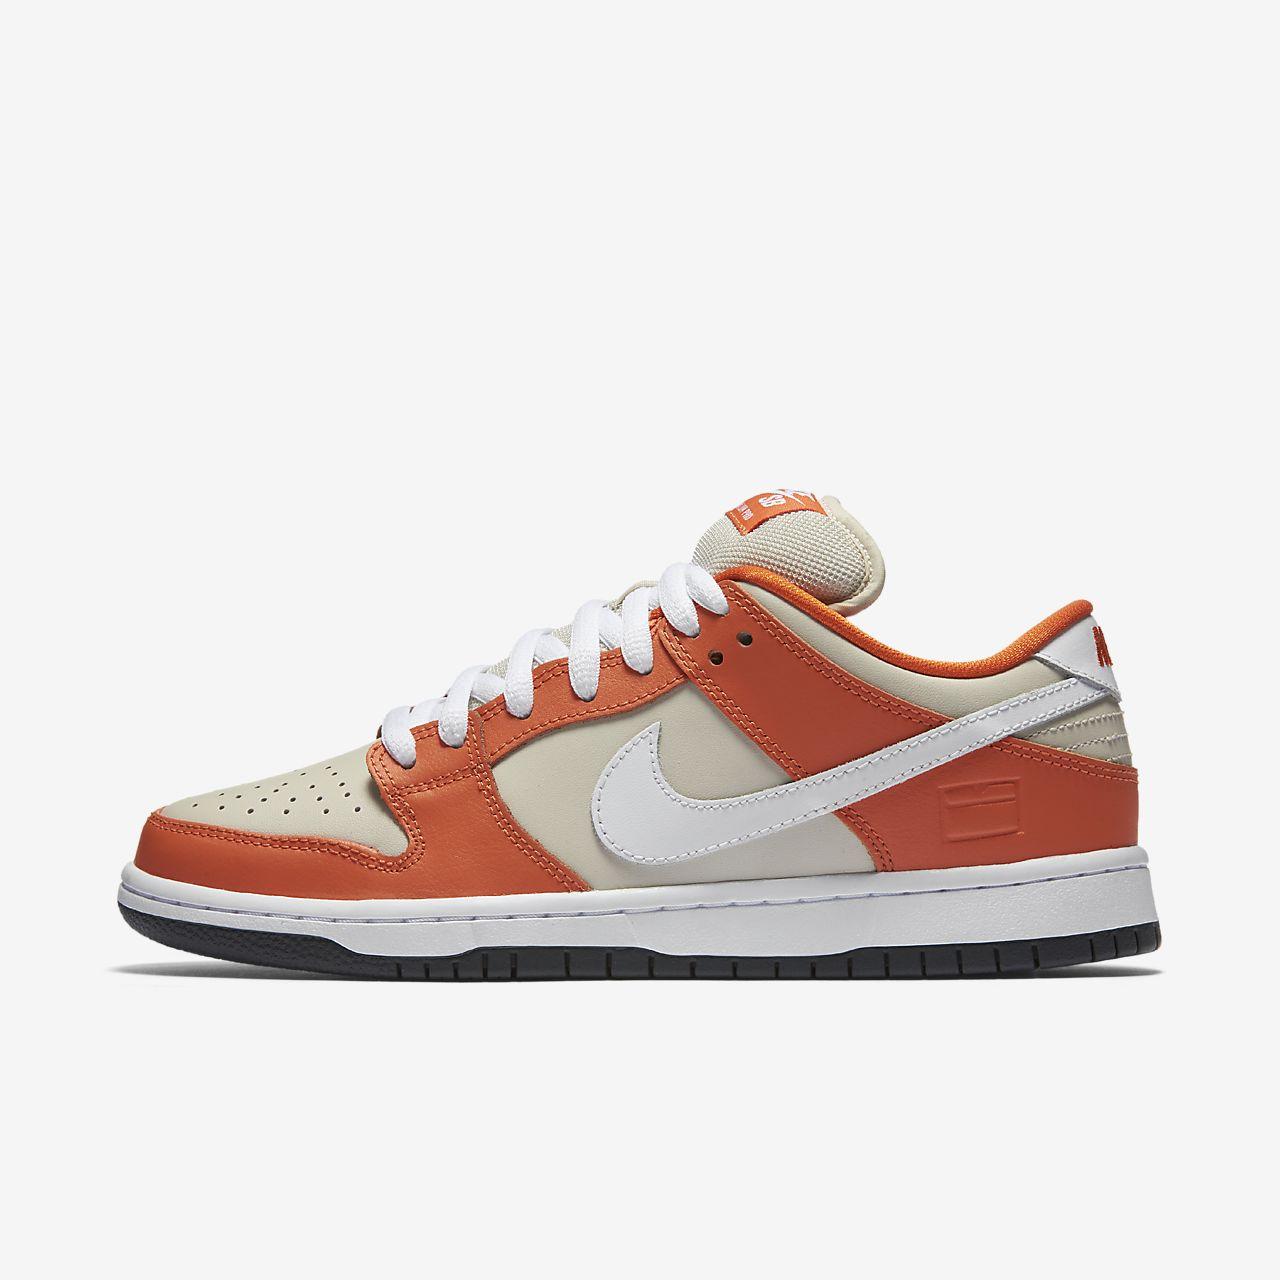 Nike Dunk Low Premium SB 男子滑板鞋